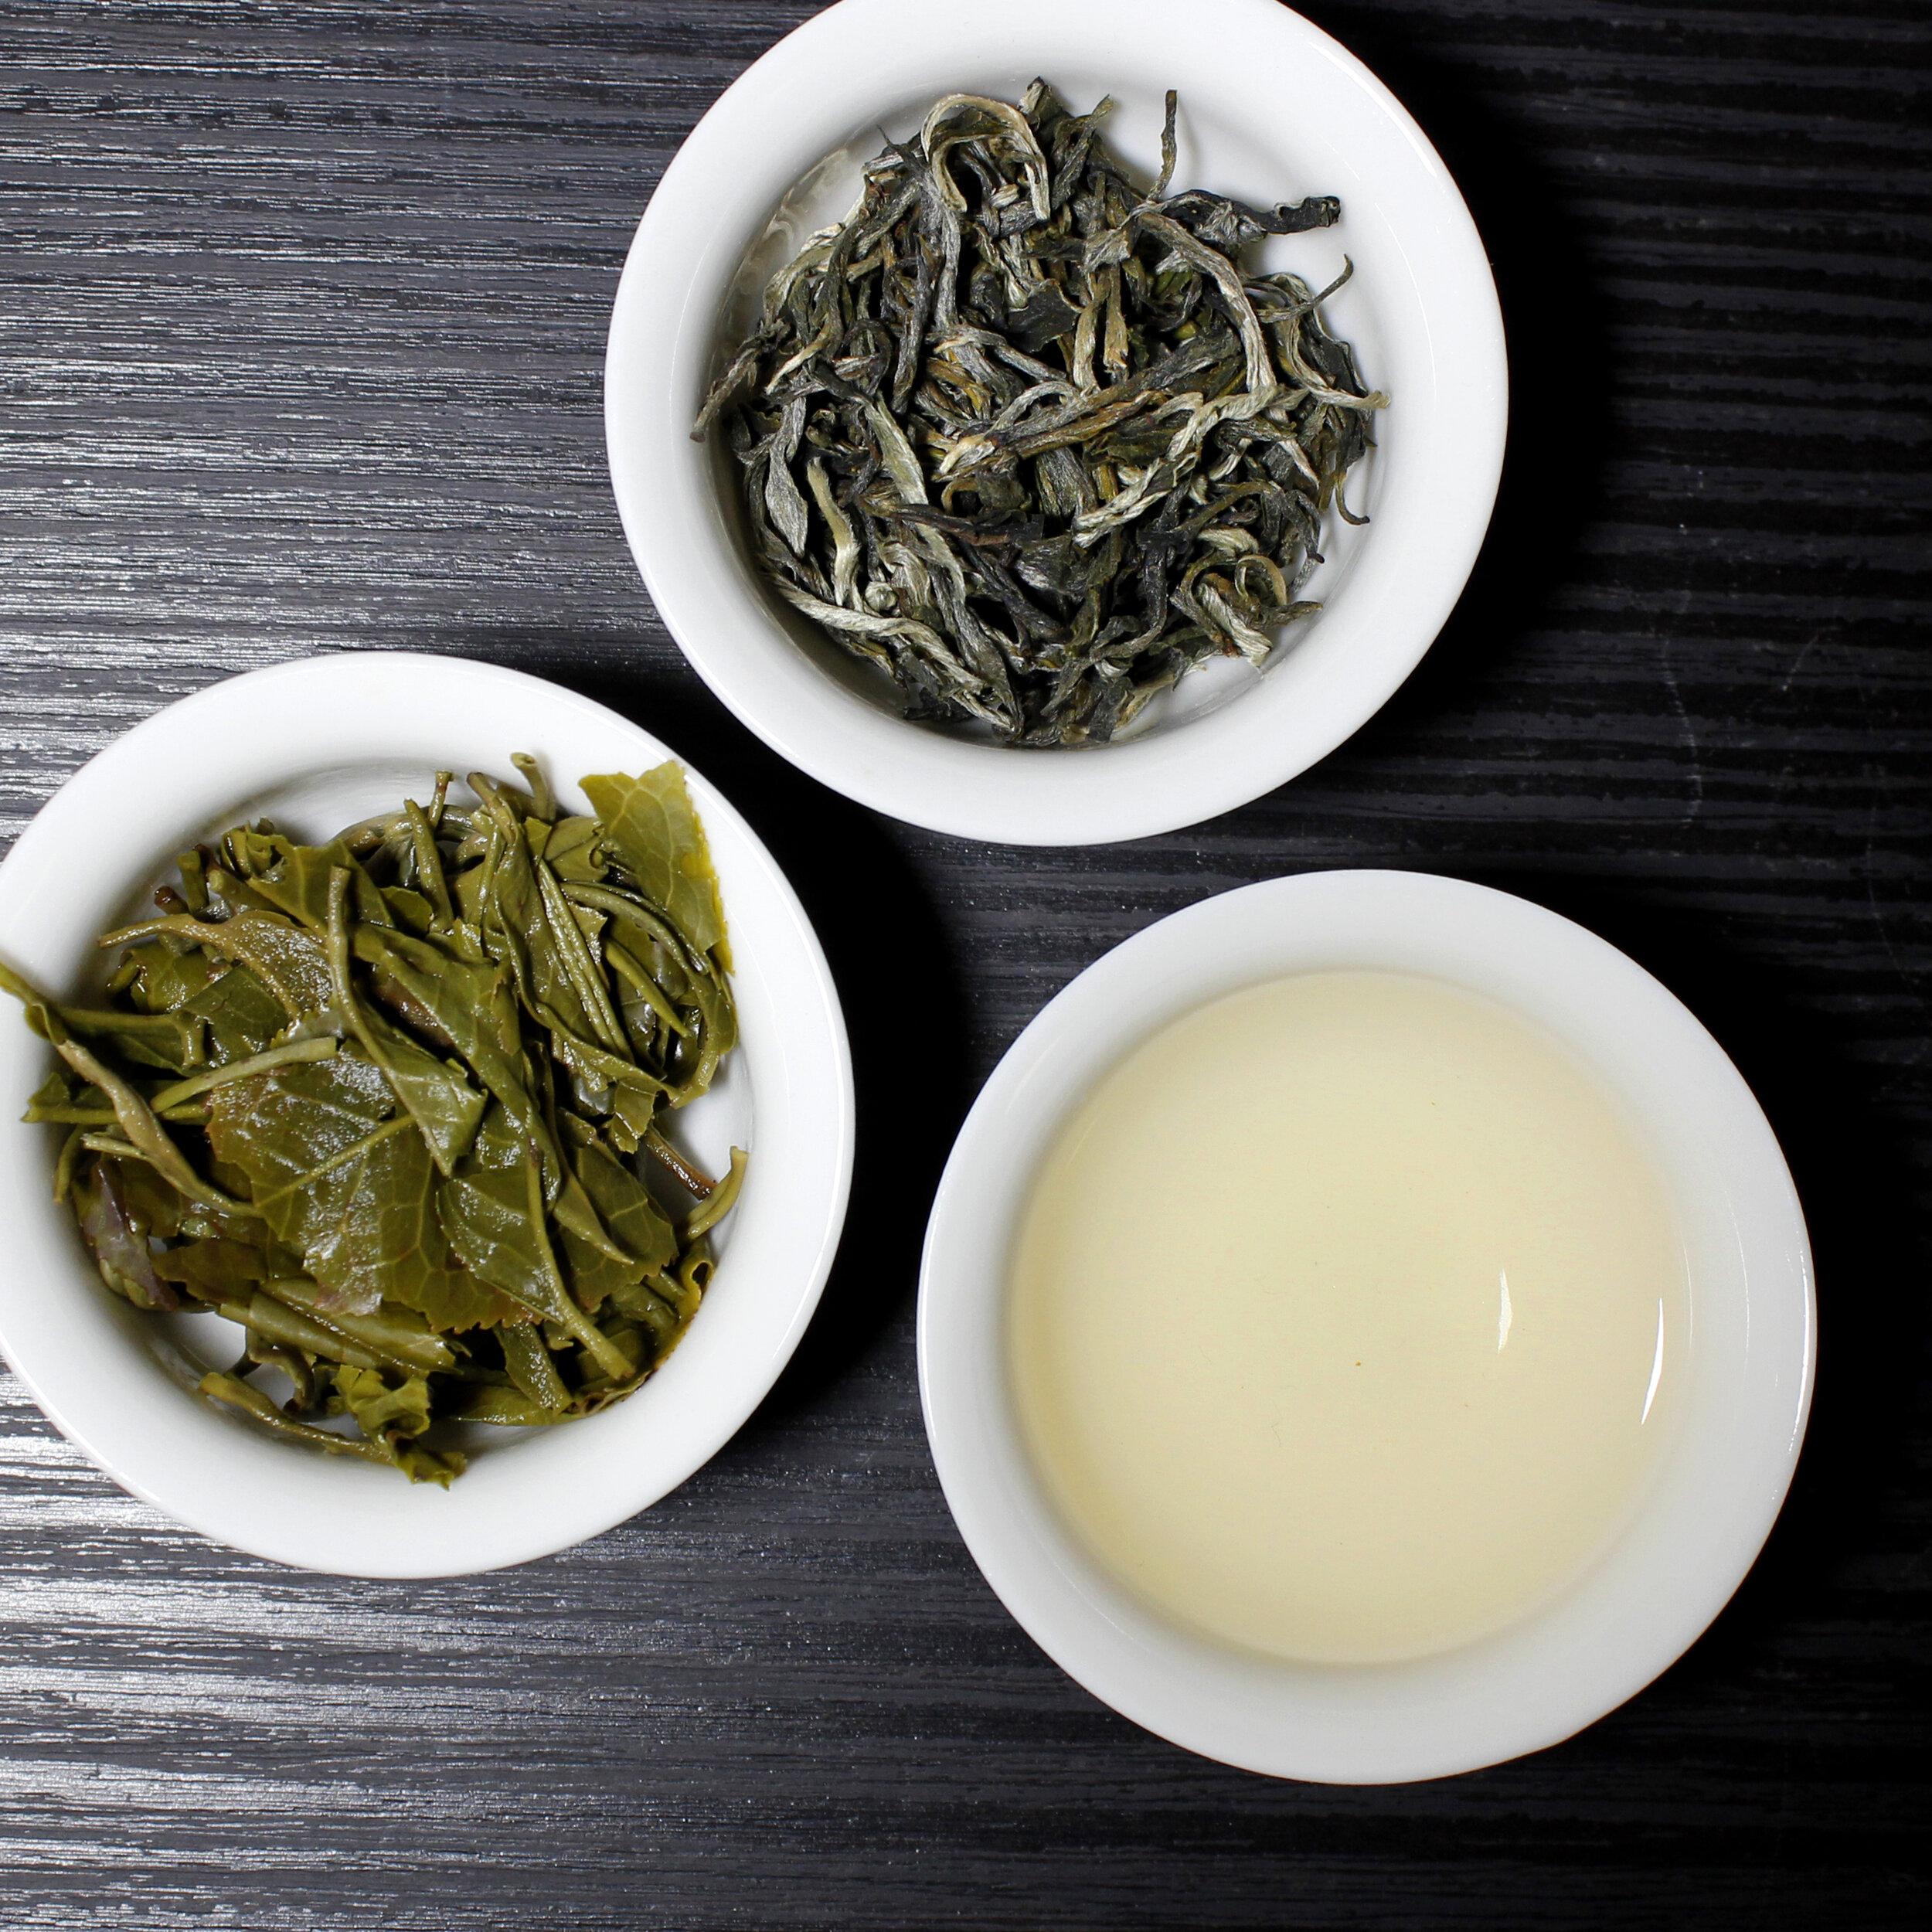 green-silk-hunan-china-green-whole-leaf-loose-mem-tea-itw2-2019a.jpg